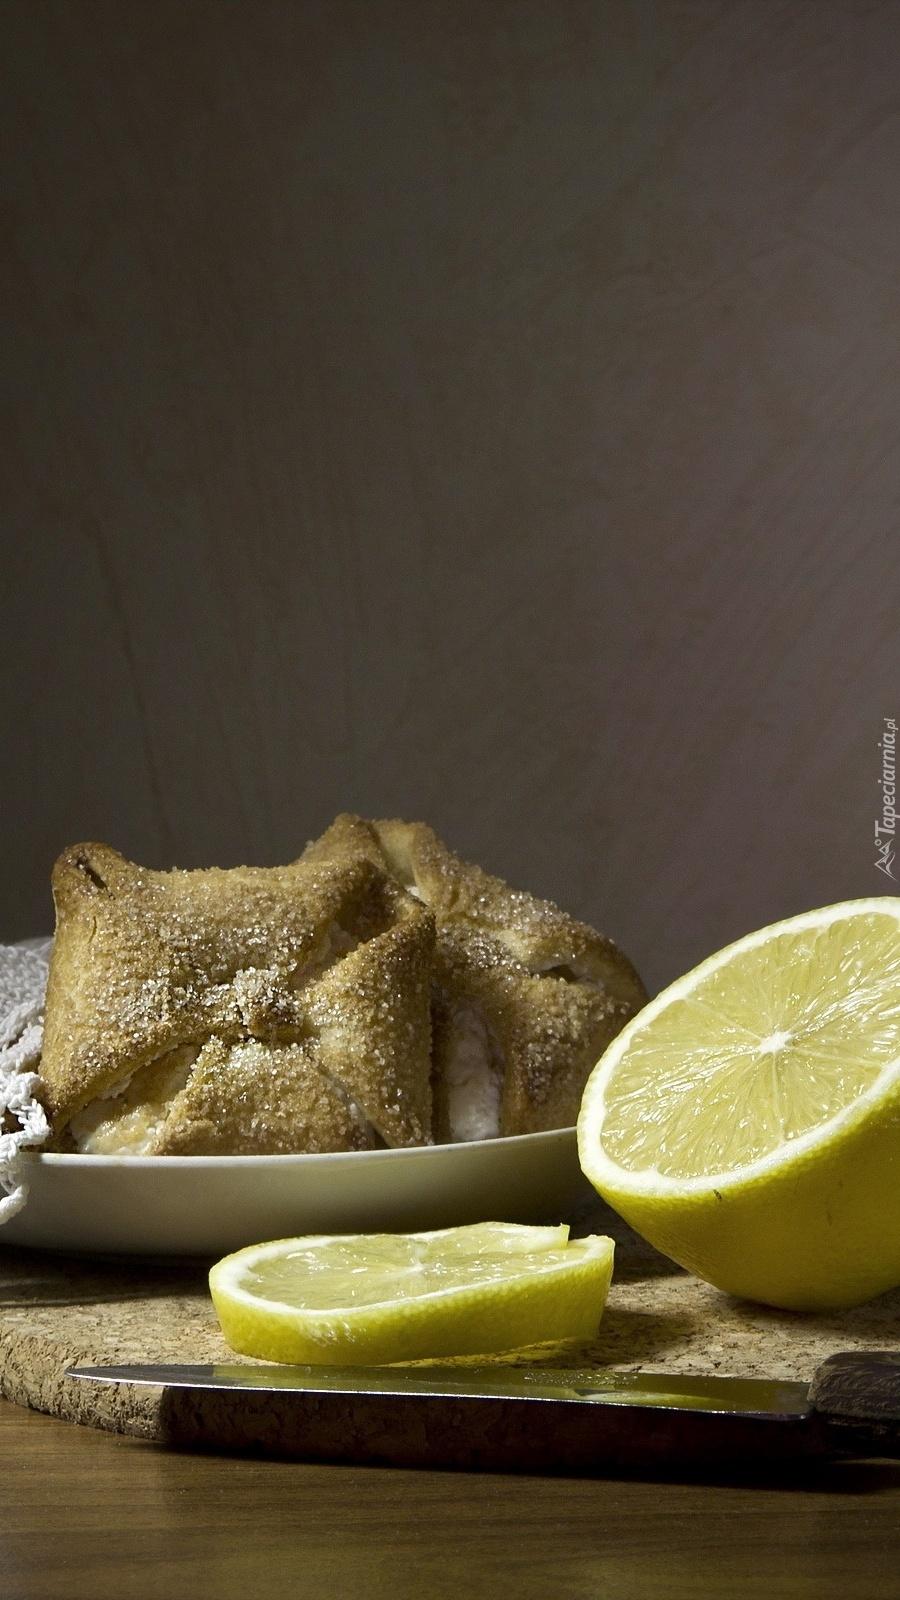 Ciasteczka i cytryna